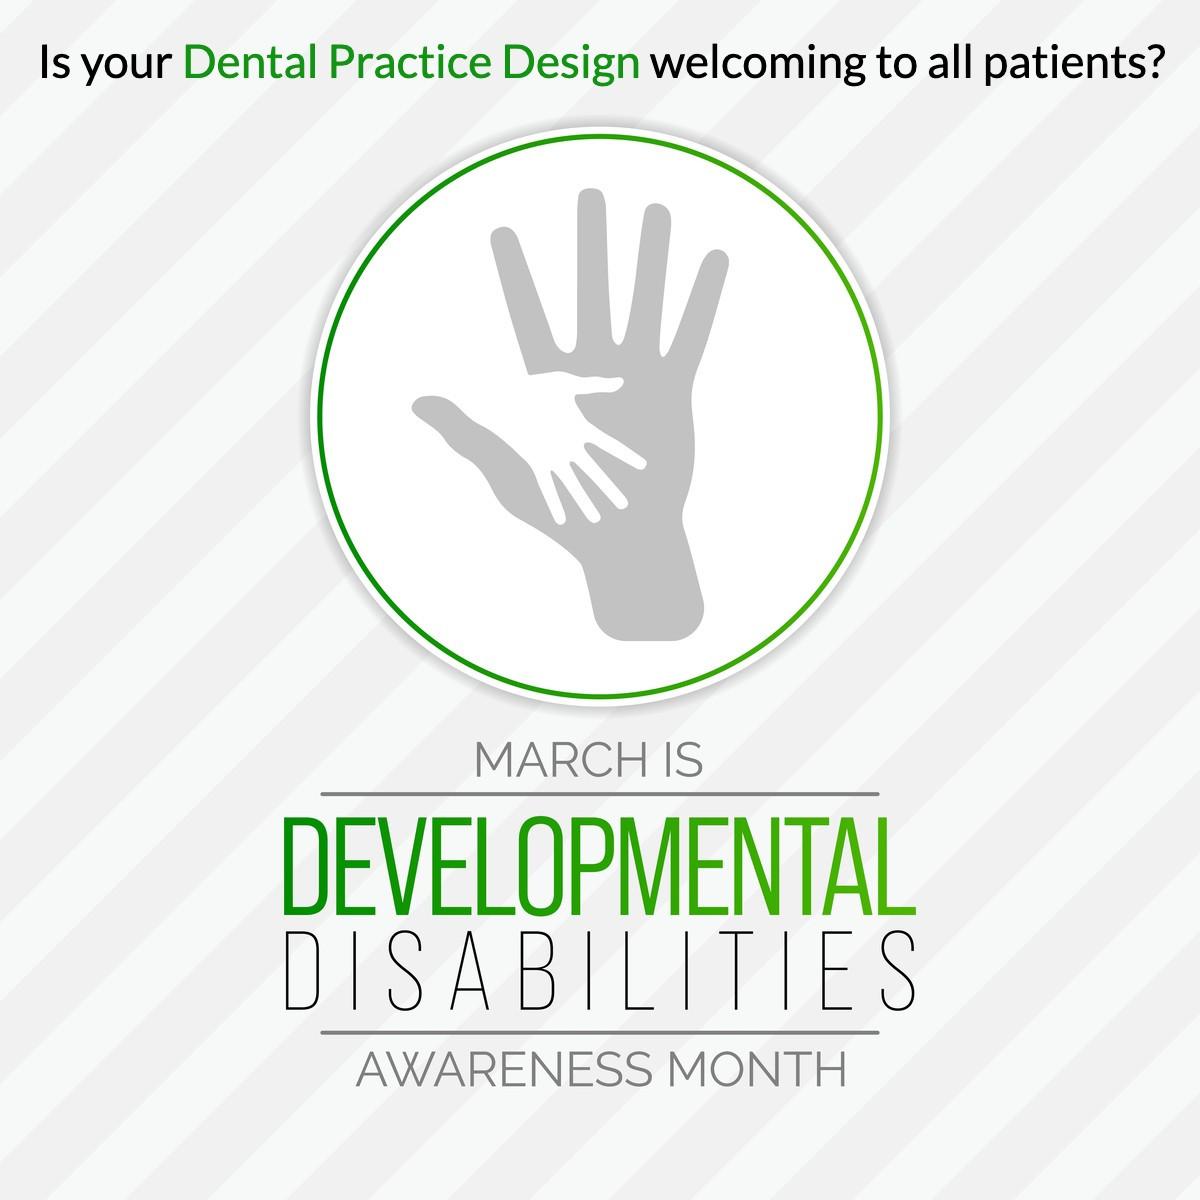 Dental Practice Design by Benco Dental Design with Developmental Disabilities Awareness Month image